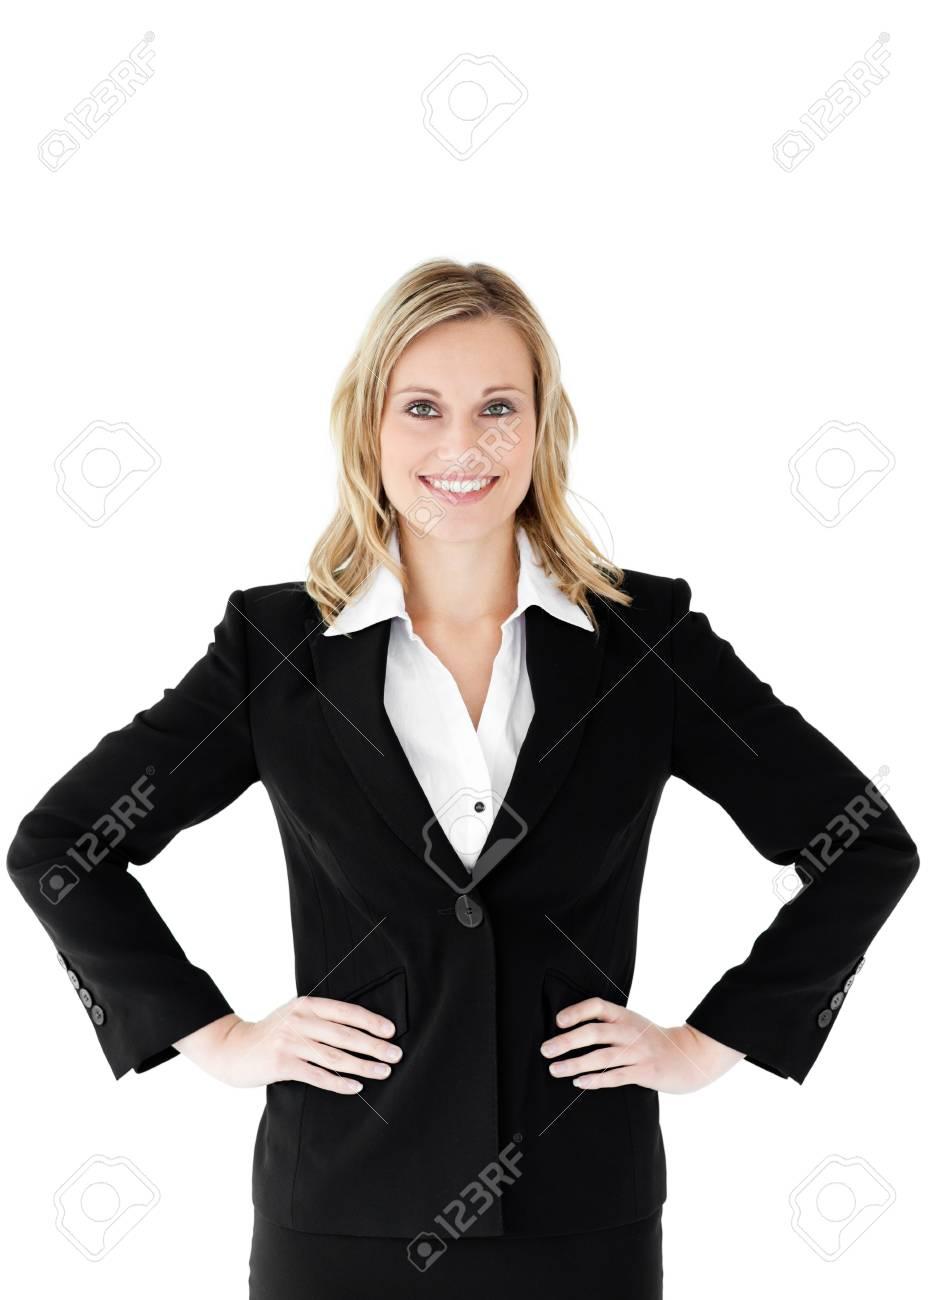 Businesswoman against white background Stock Photo - 10234129